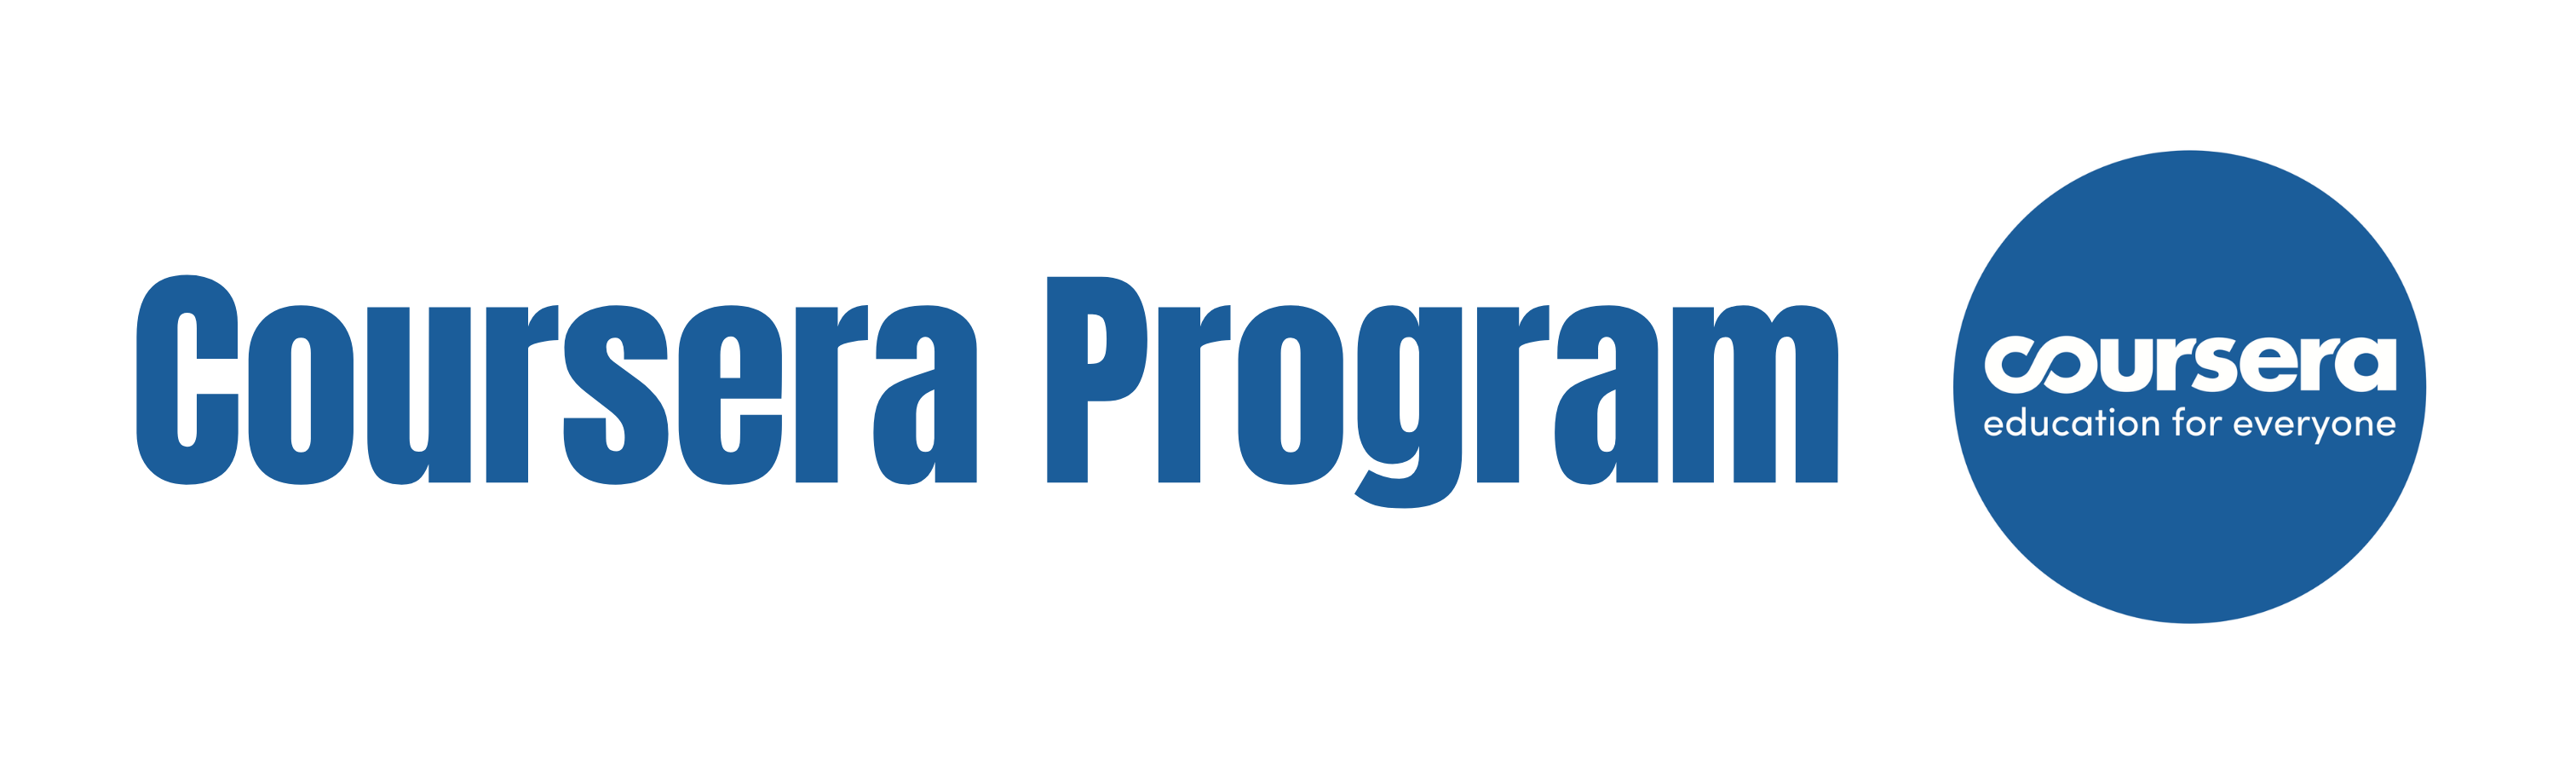 coursera program